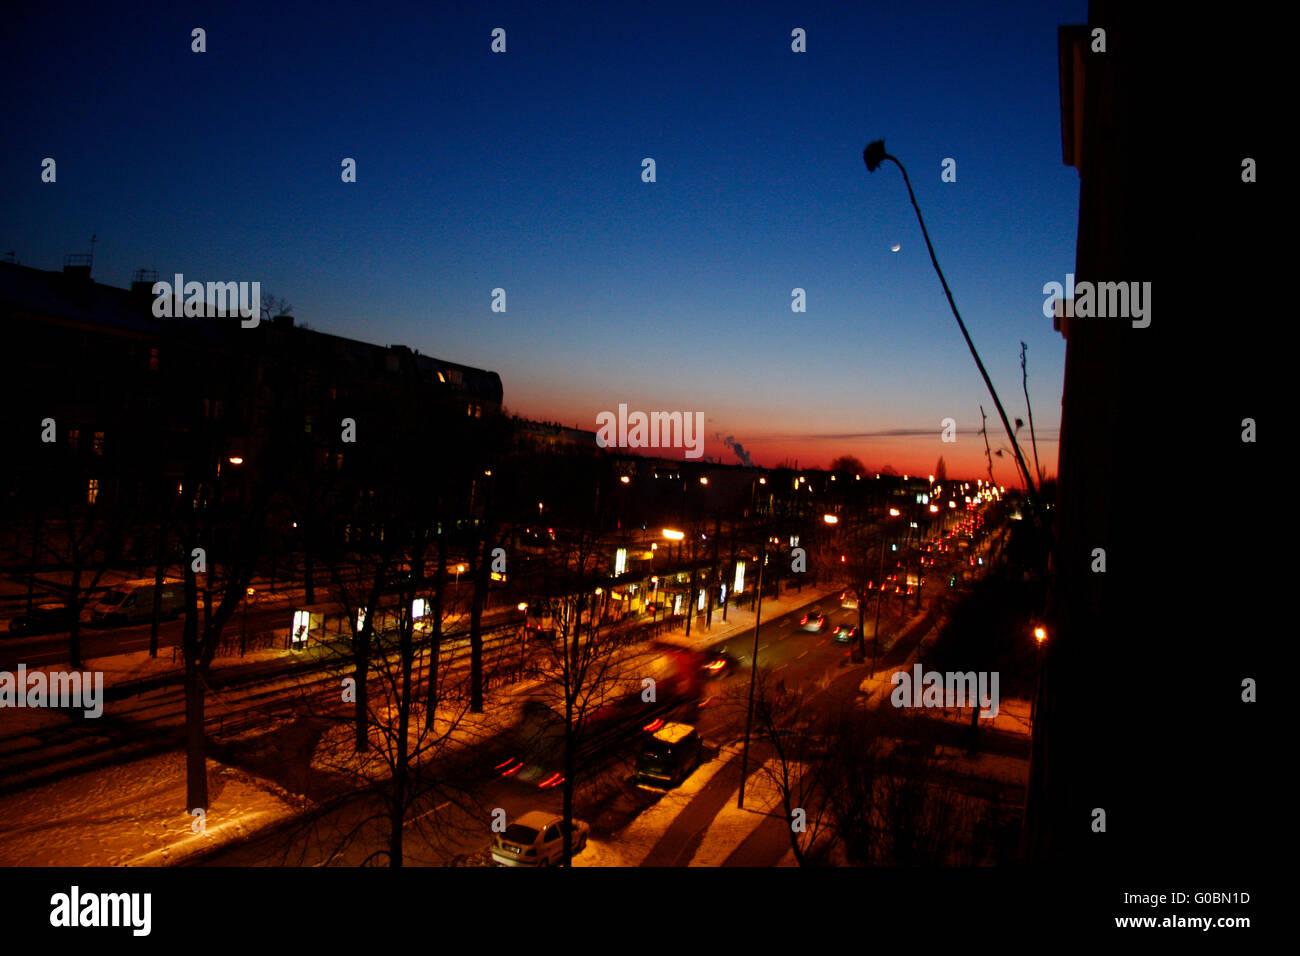 Sonnenuntergang, Bornholmer Strasse, Berlin-Prenzlauer Berg. - Stock Image